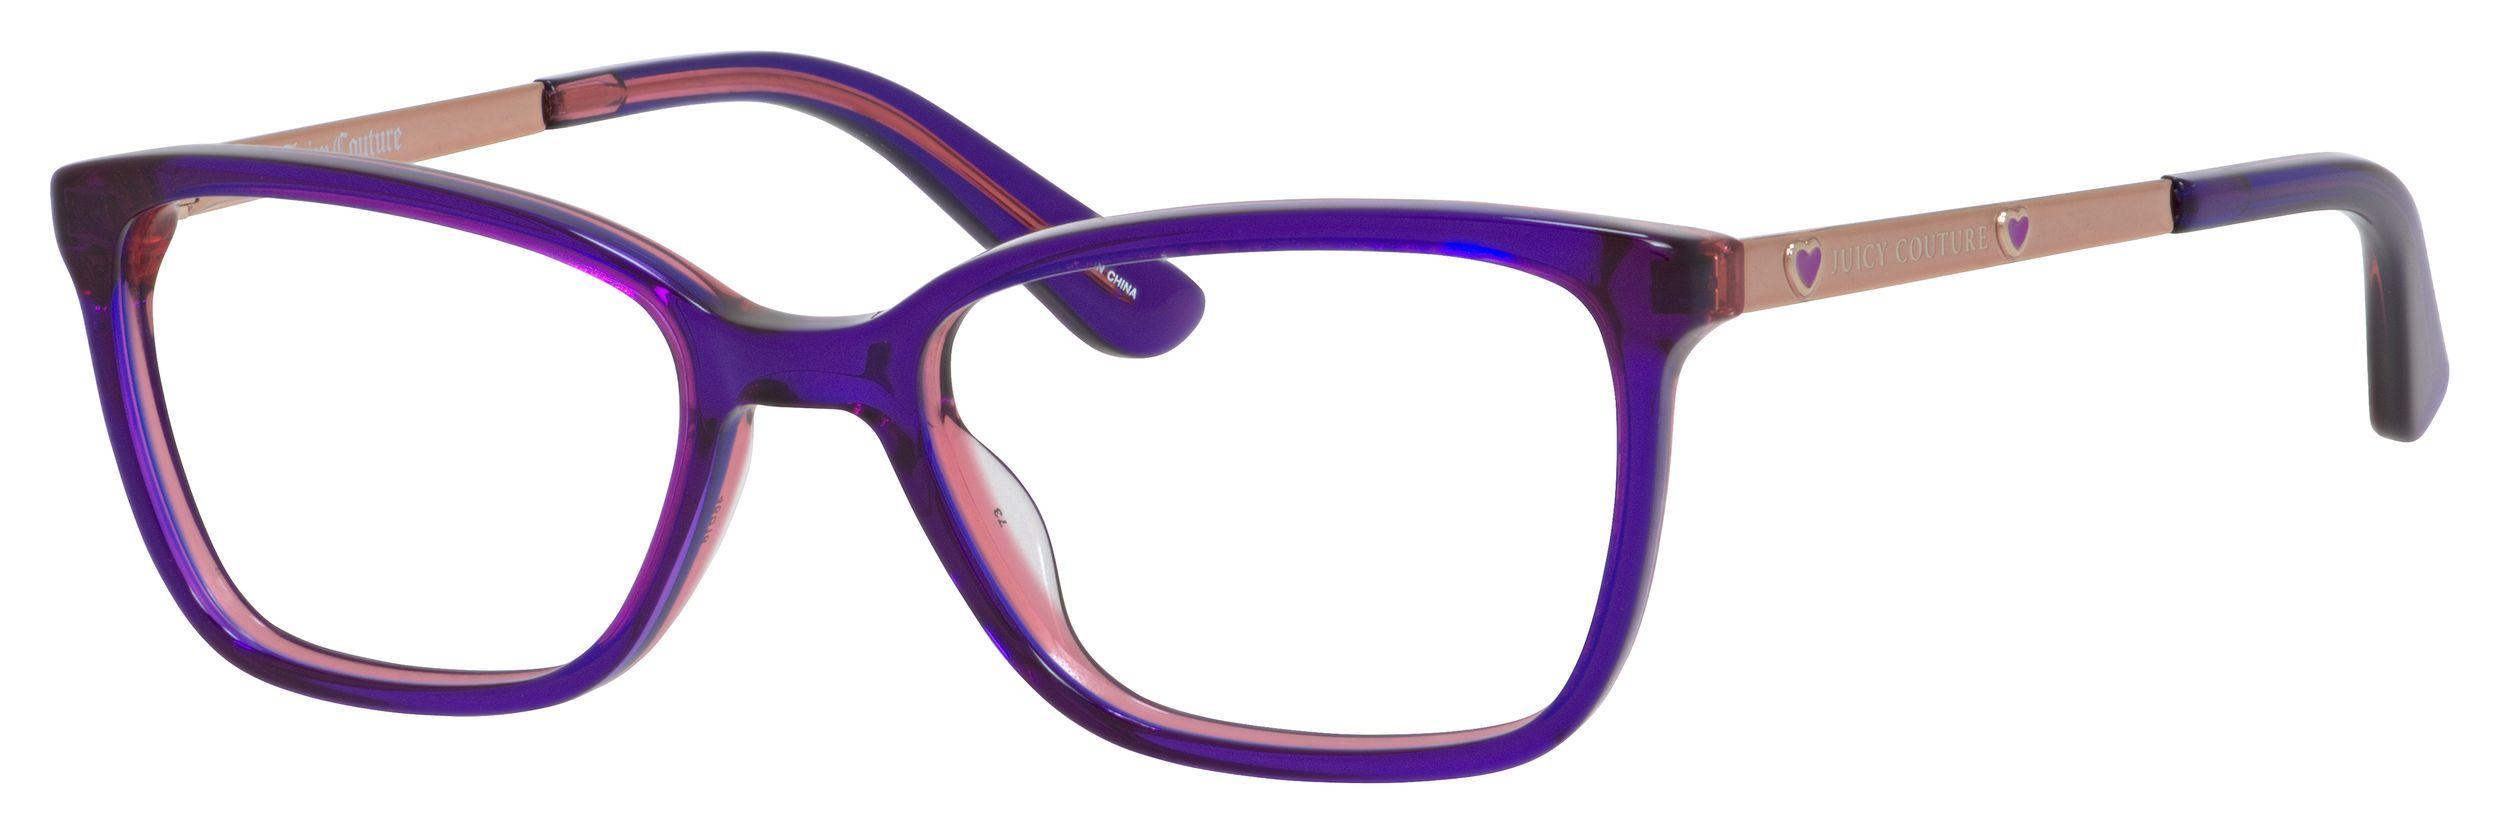 26e028e670a Eyewear for Kids - Girl Purple - Optiwow